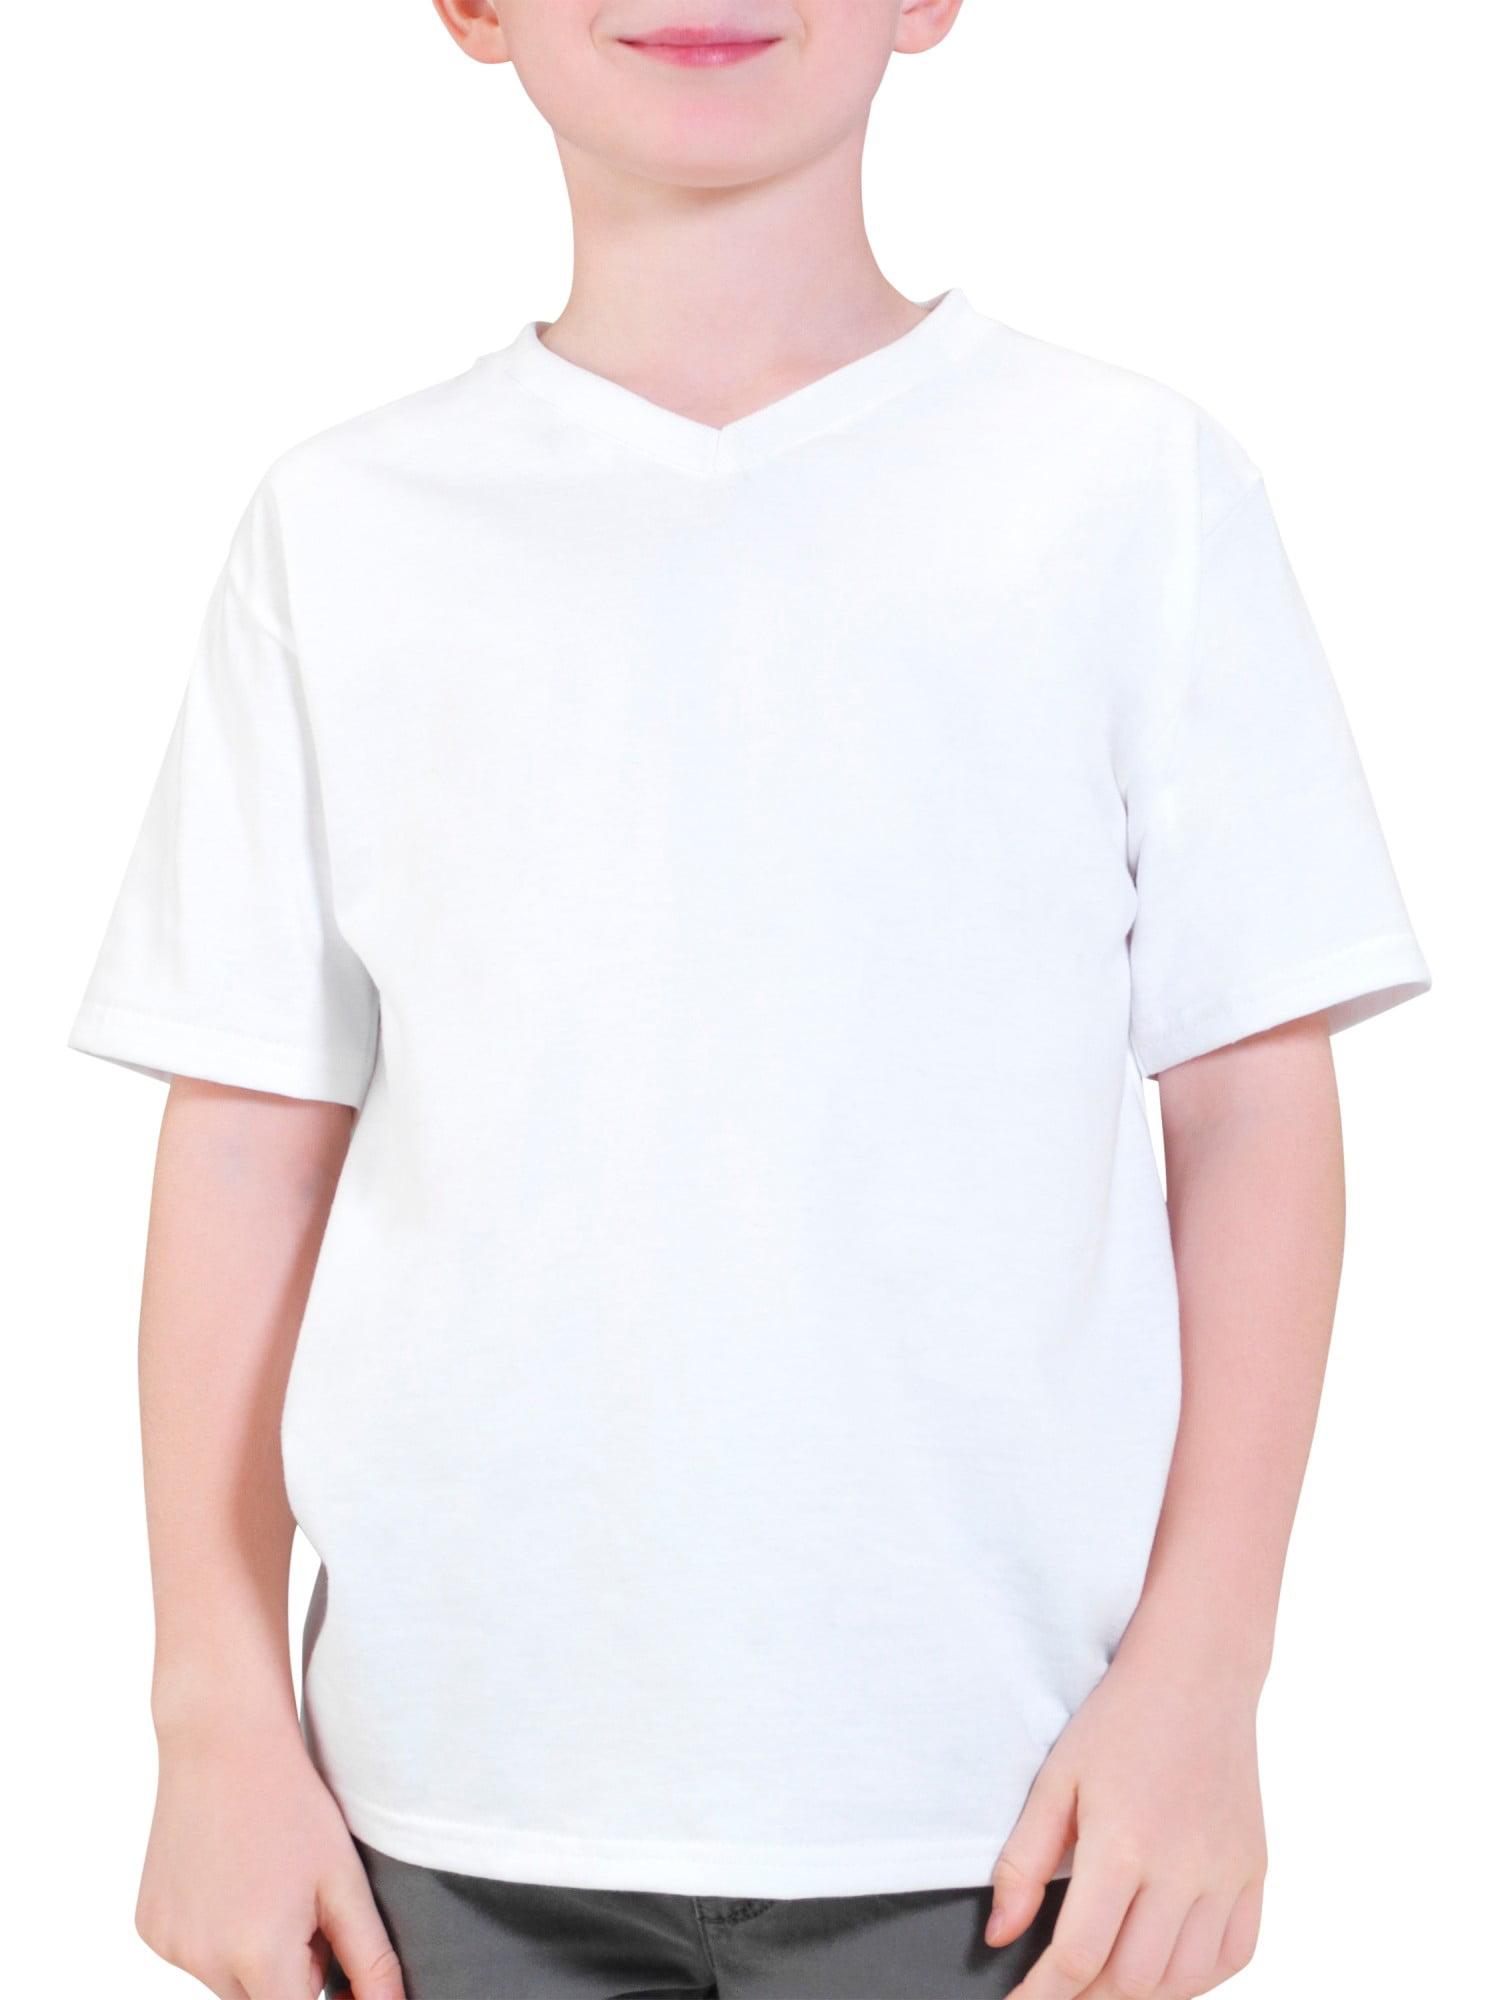 Boys' Short Sleeve V-Neck T Shirt by Fruit of the Loom